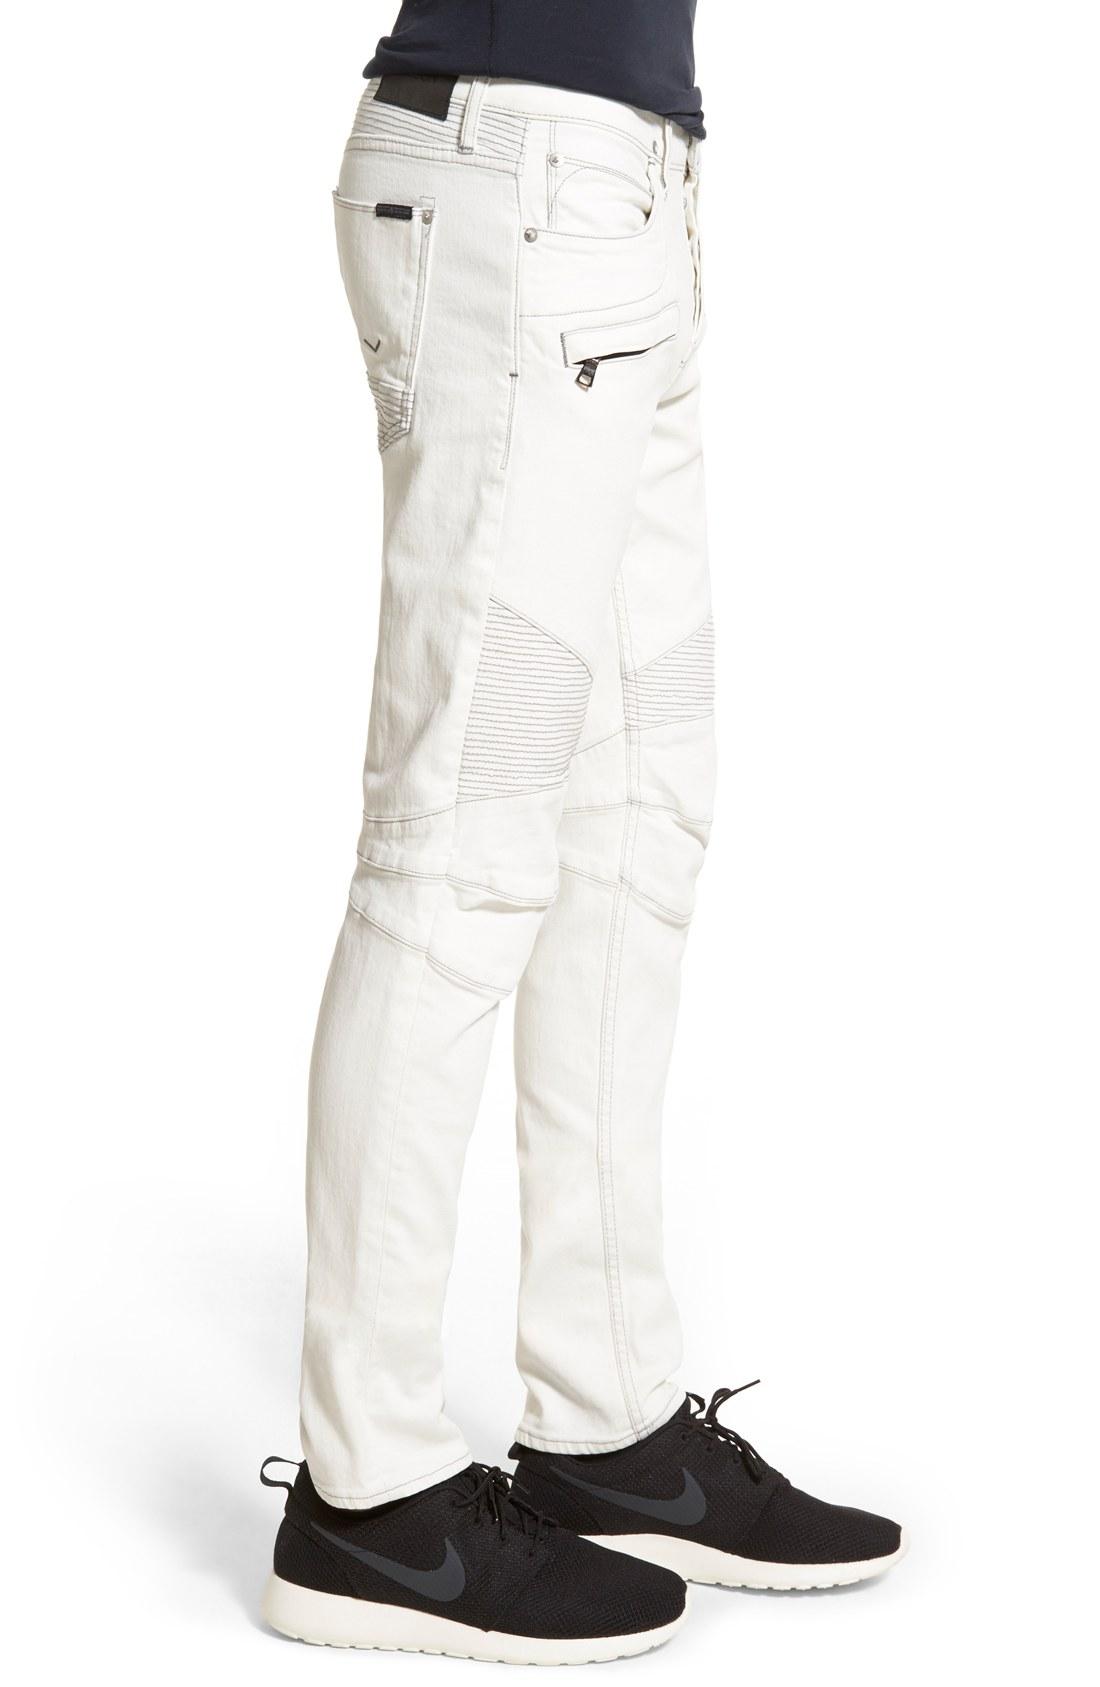 Hudson-Blender-Skinny-Fit-Moto-Jeans-Peroxide-3